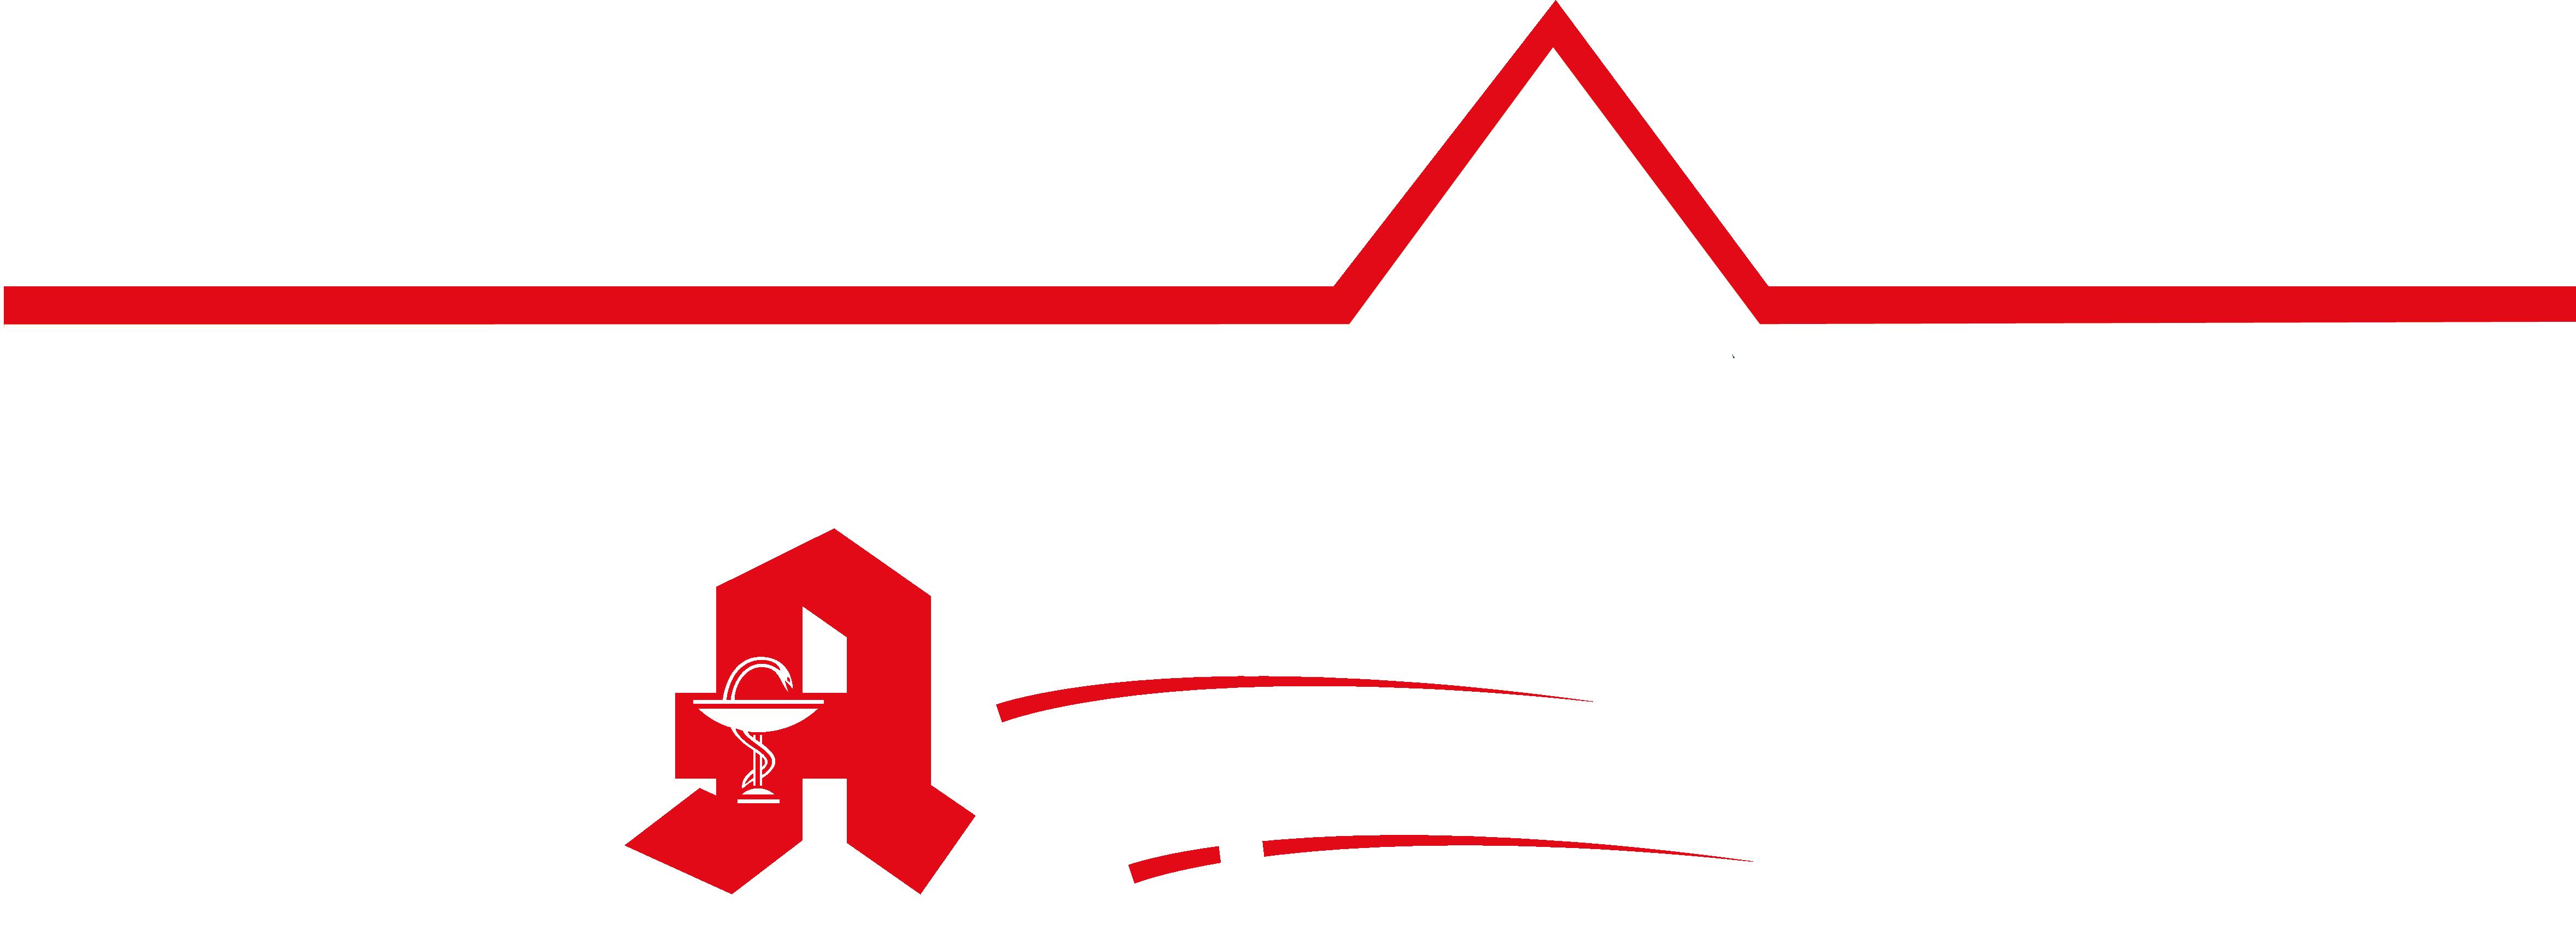 Eulenthurm-Apotheke-Weißenthurm-negativ